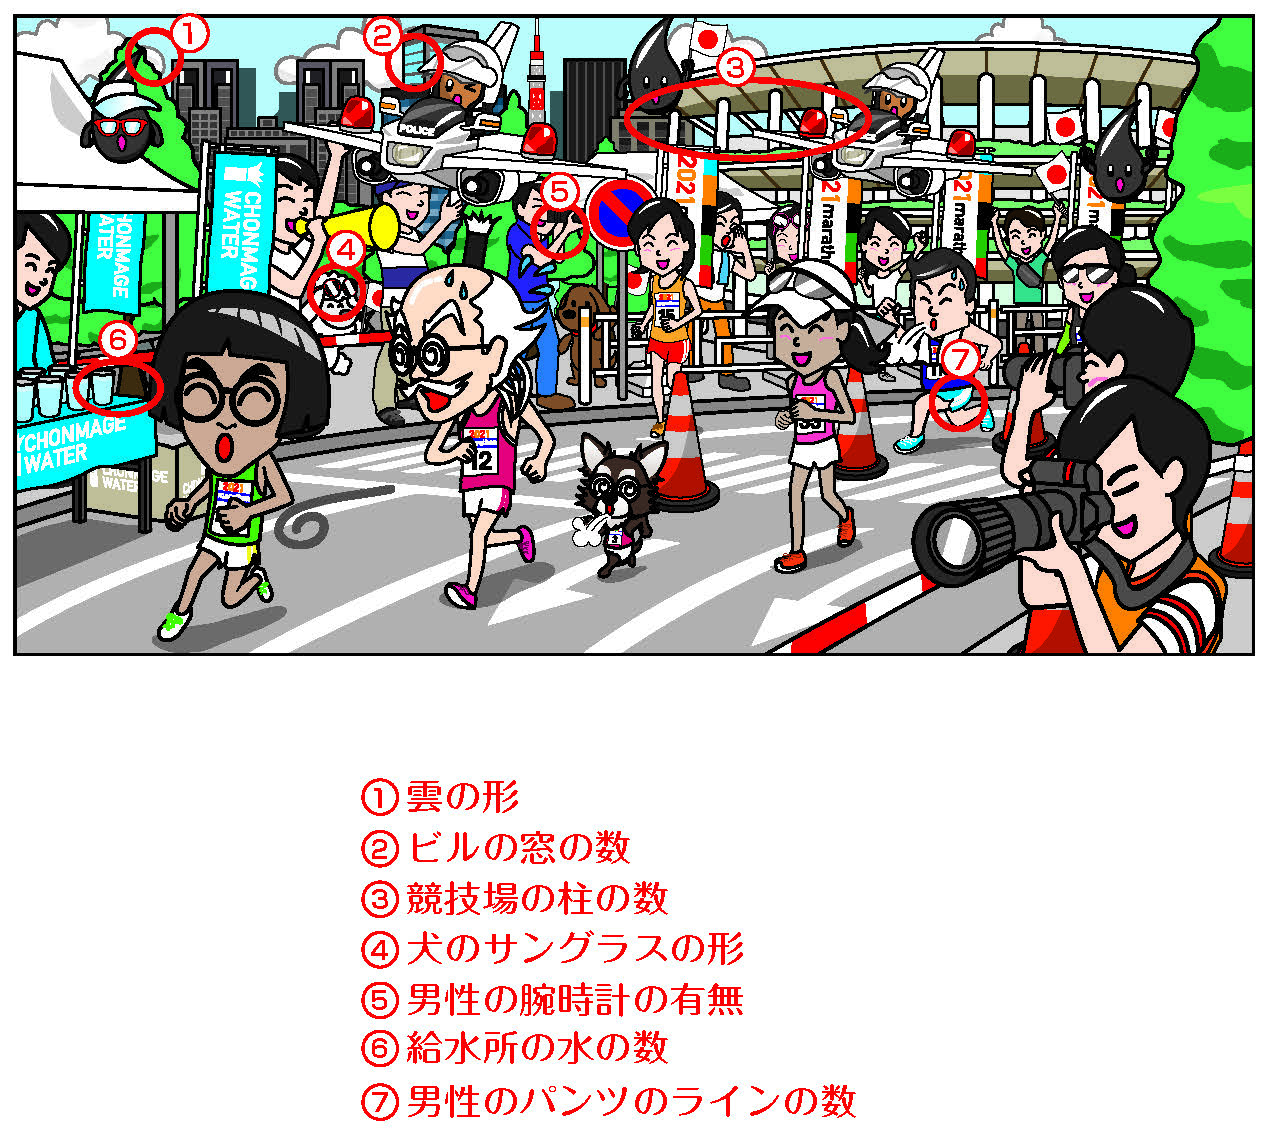 https://jakusan.net/community/images/168%E5%8F%B7_%E8%A7%A3%E7%AD%94%E6%9C%80%E7%B5%82%E7%89%88.jpg